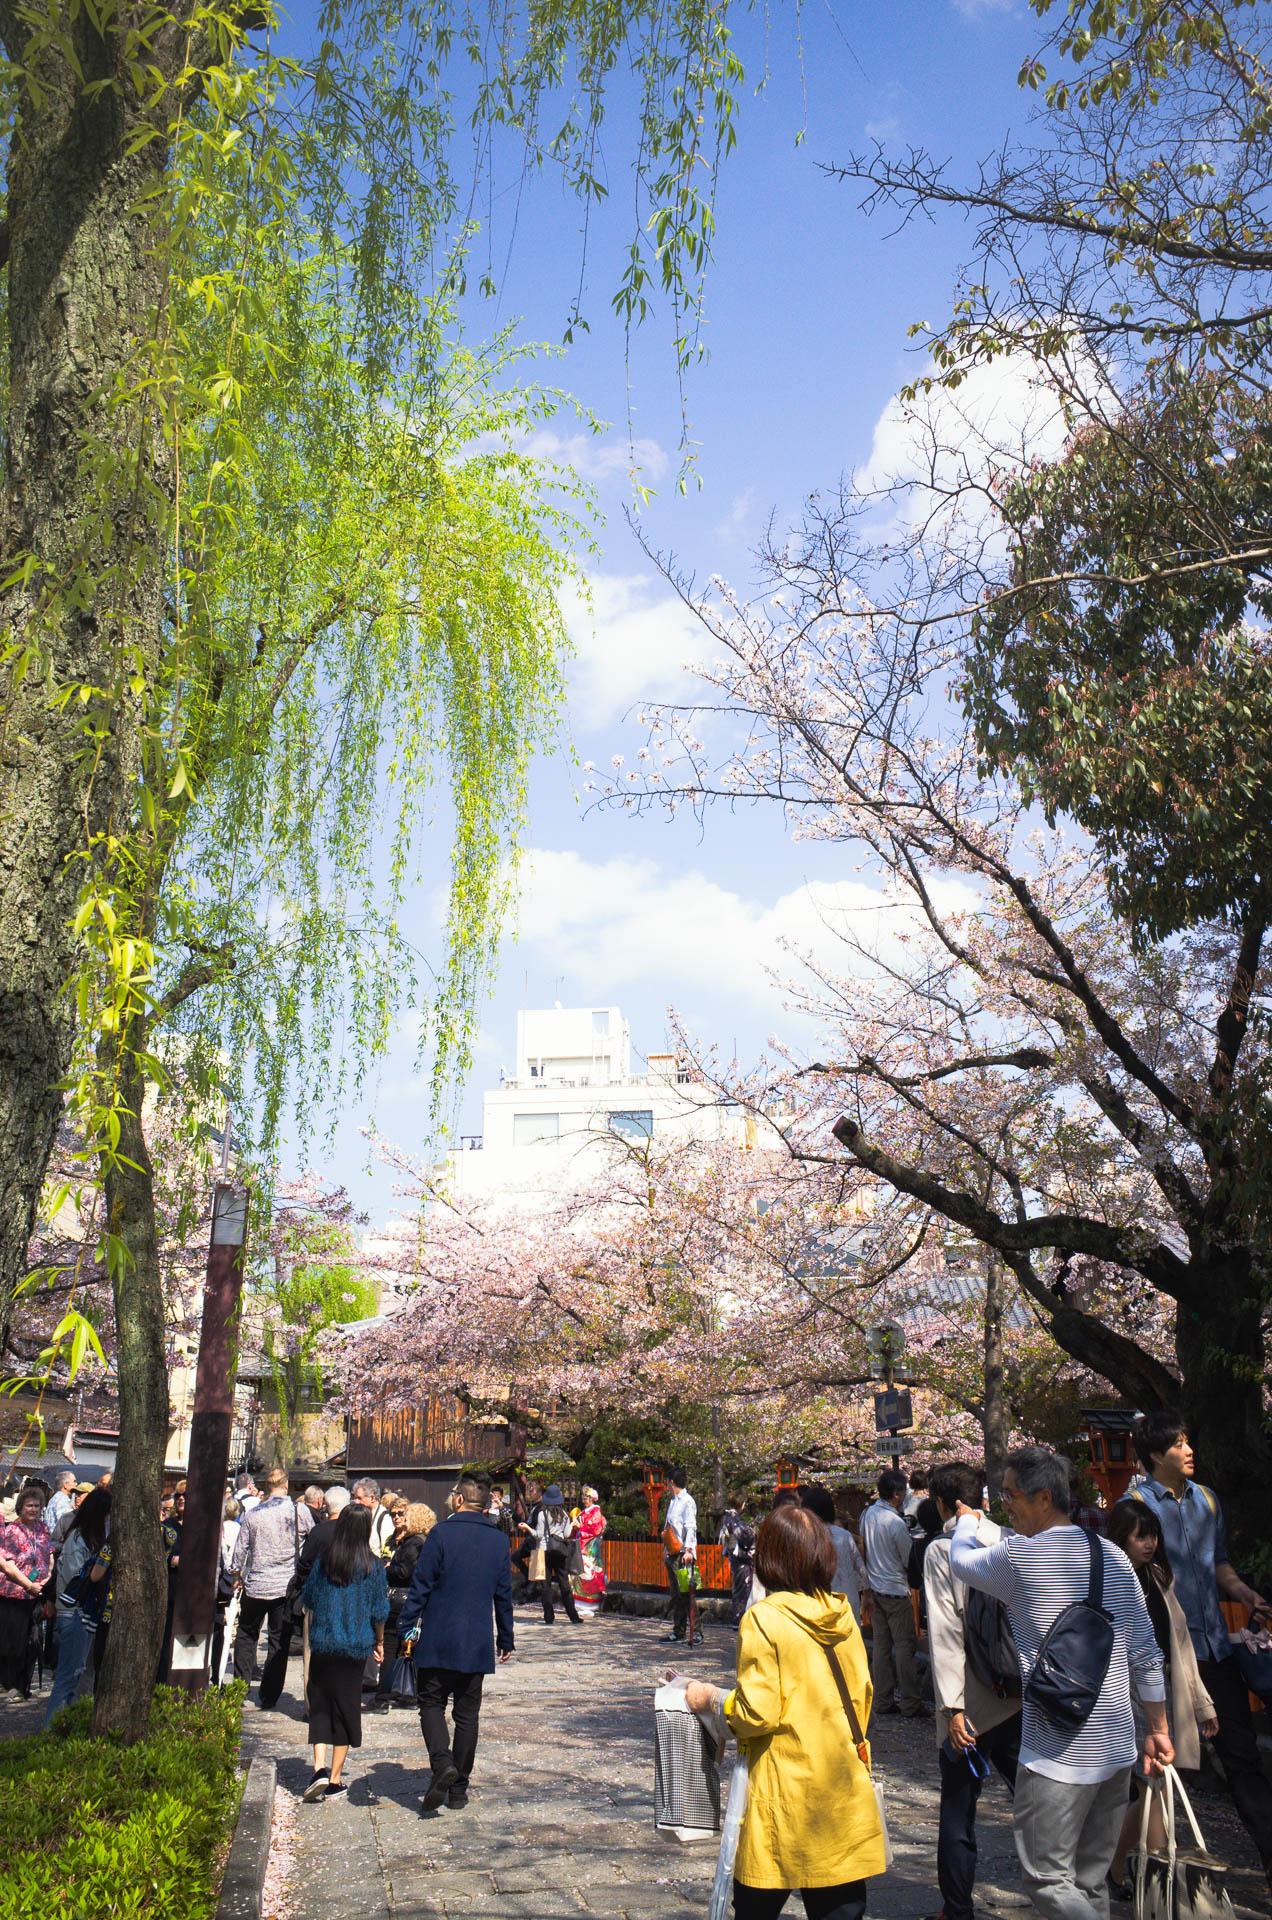 祇園 旅行 おすすめ